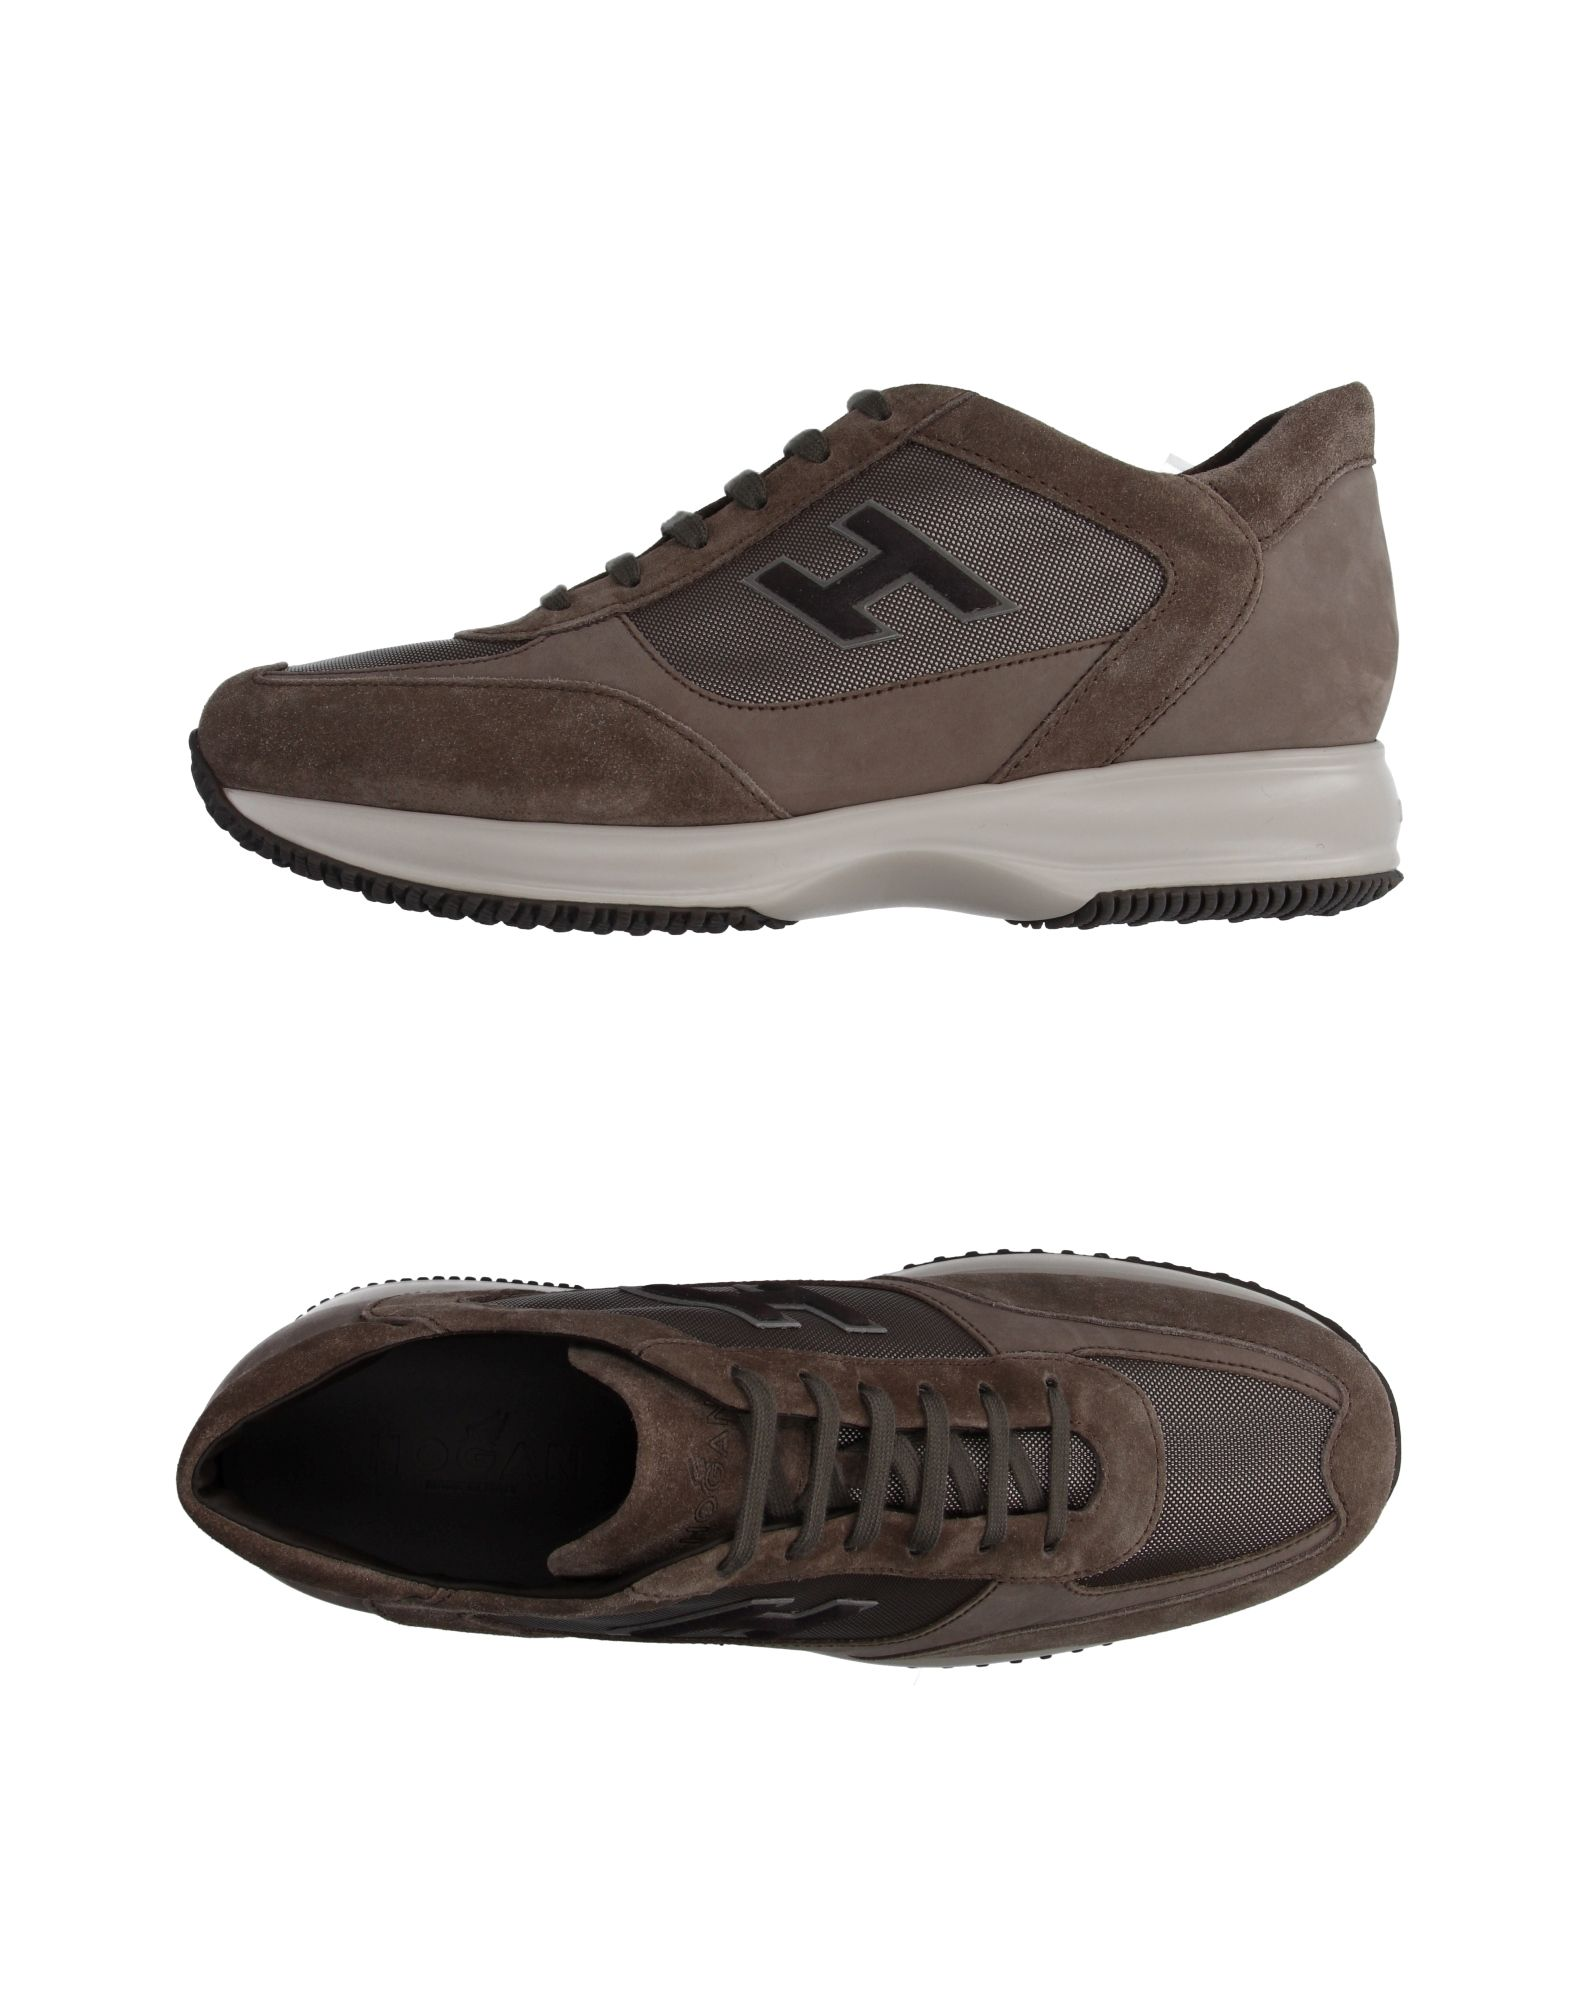 Moda Sneakers Hogan Uomo - 11039840TK